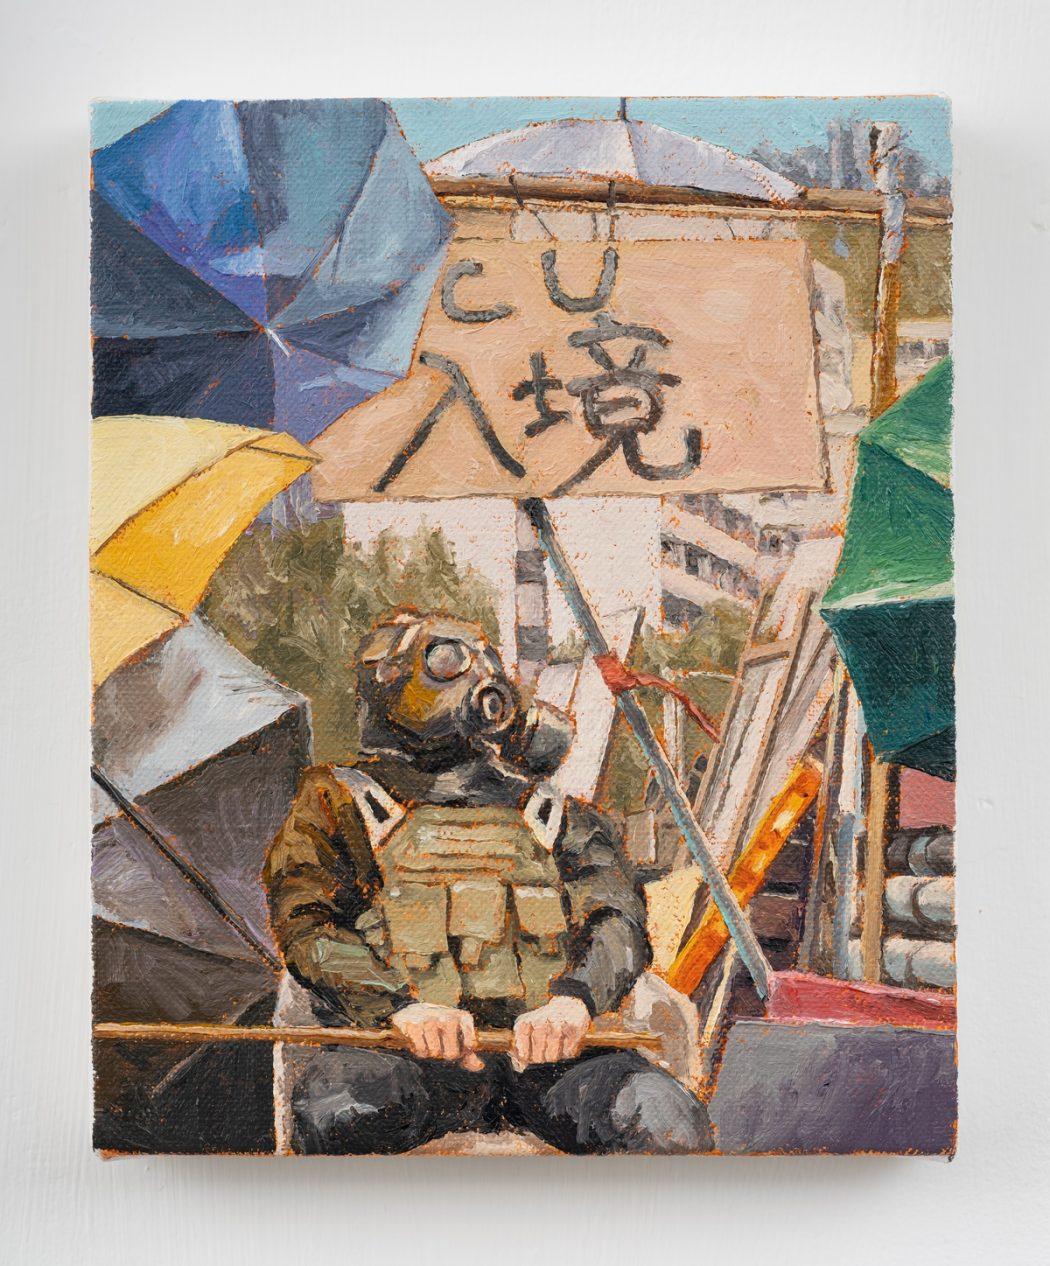 HKFP Lens Chow Chun-fai protest Chinese University